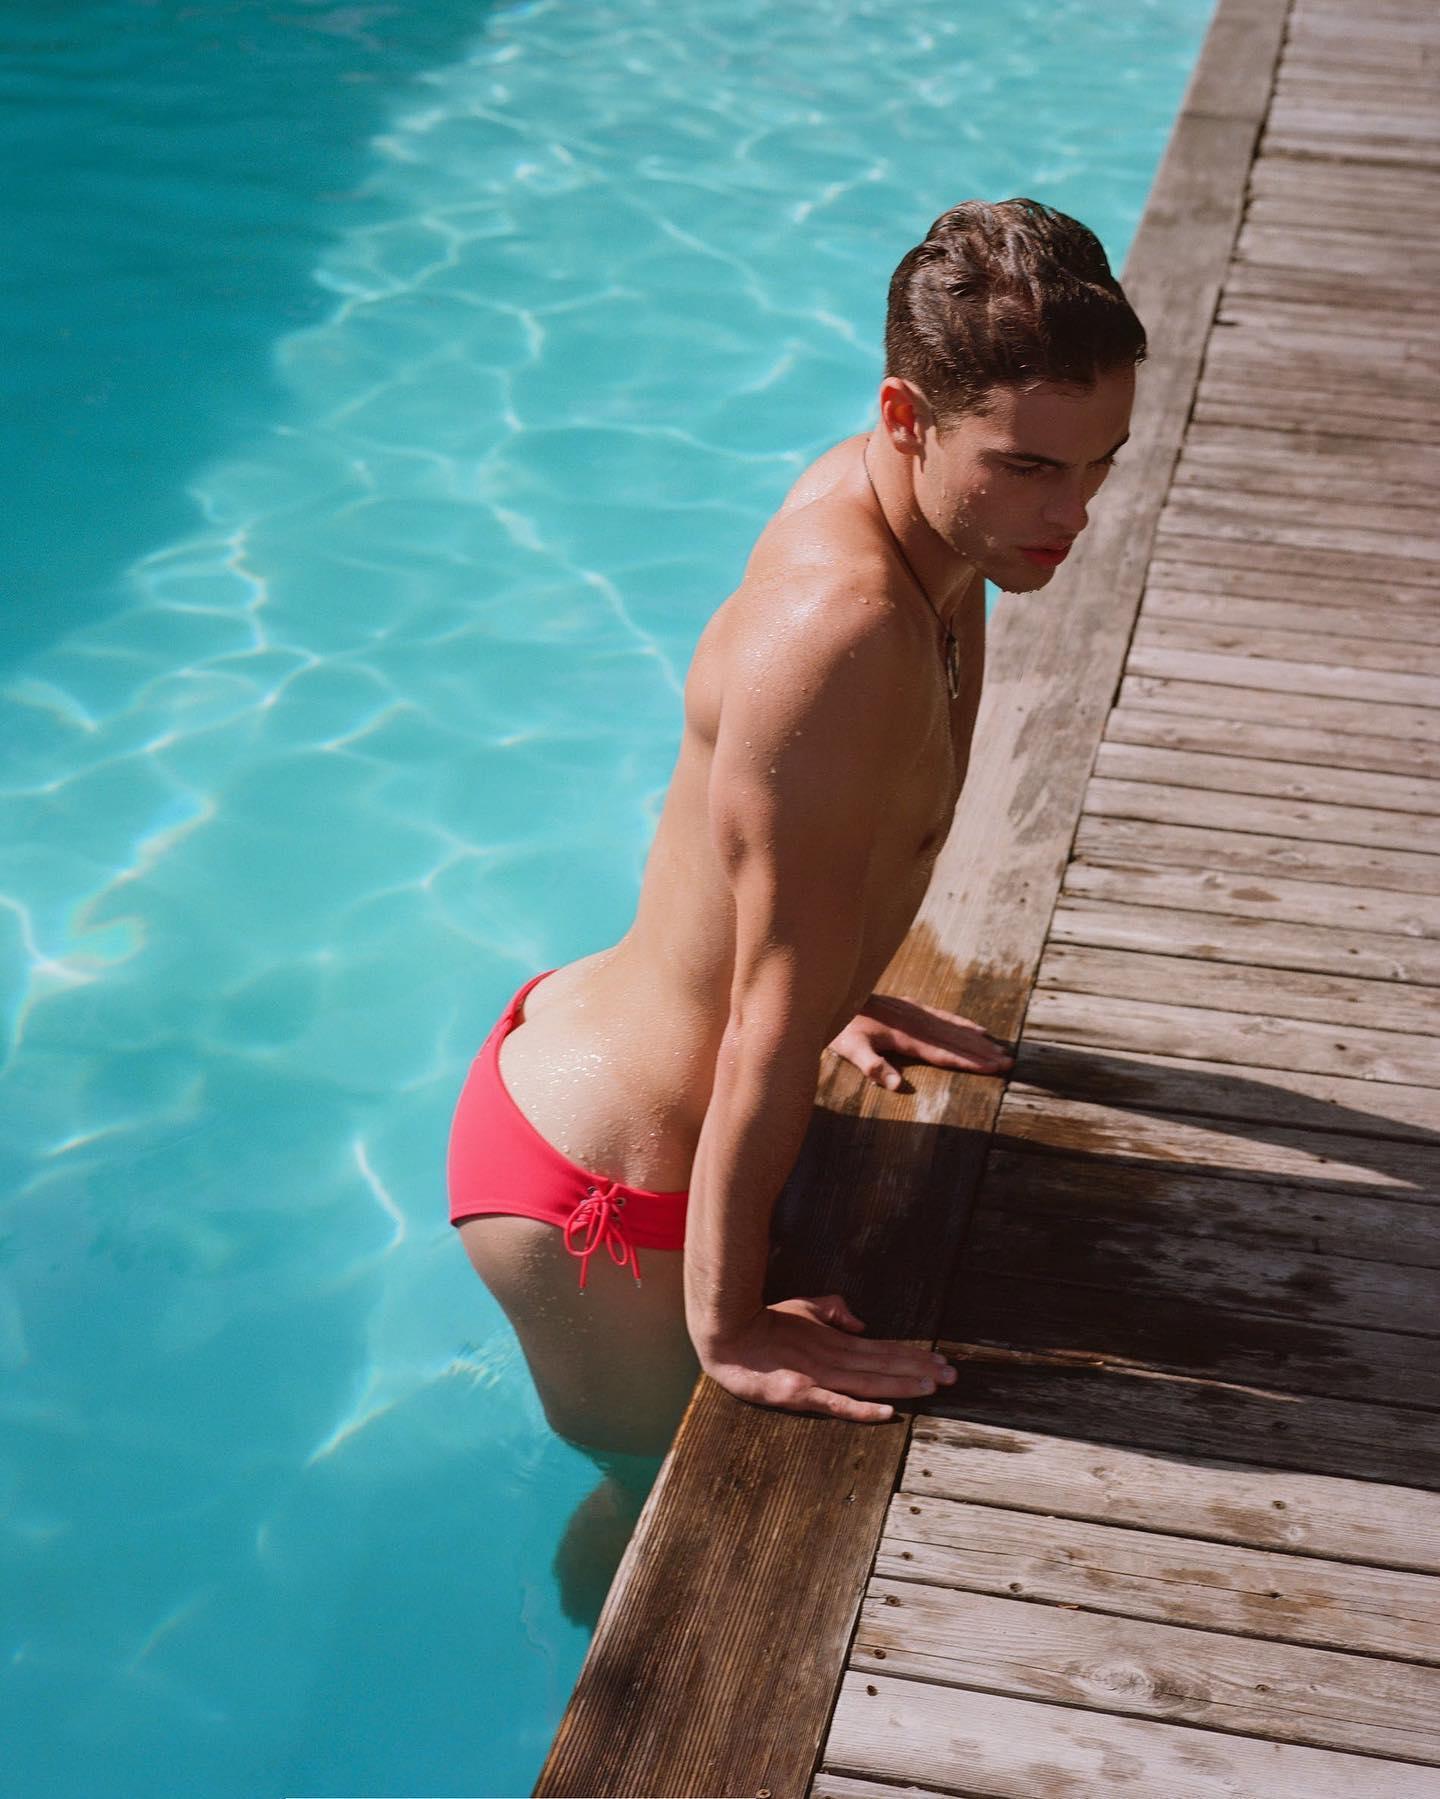 Ludovic de Saint Sernin Summer 2020 Fashion Ad Campaign Photos